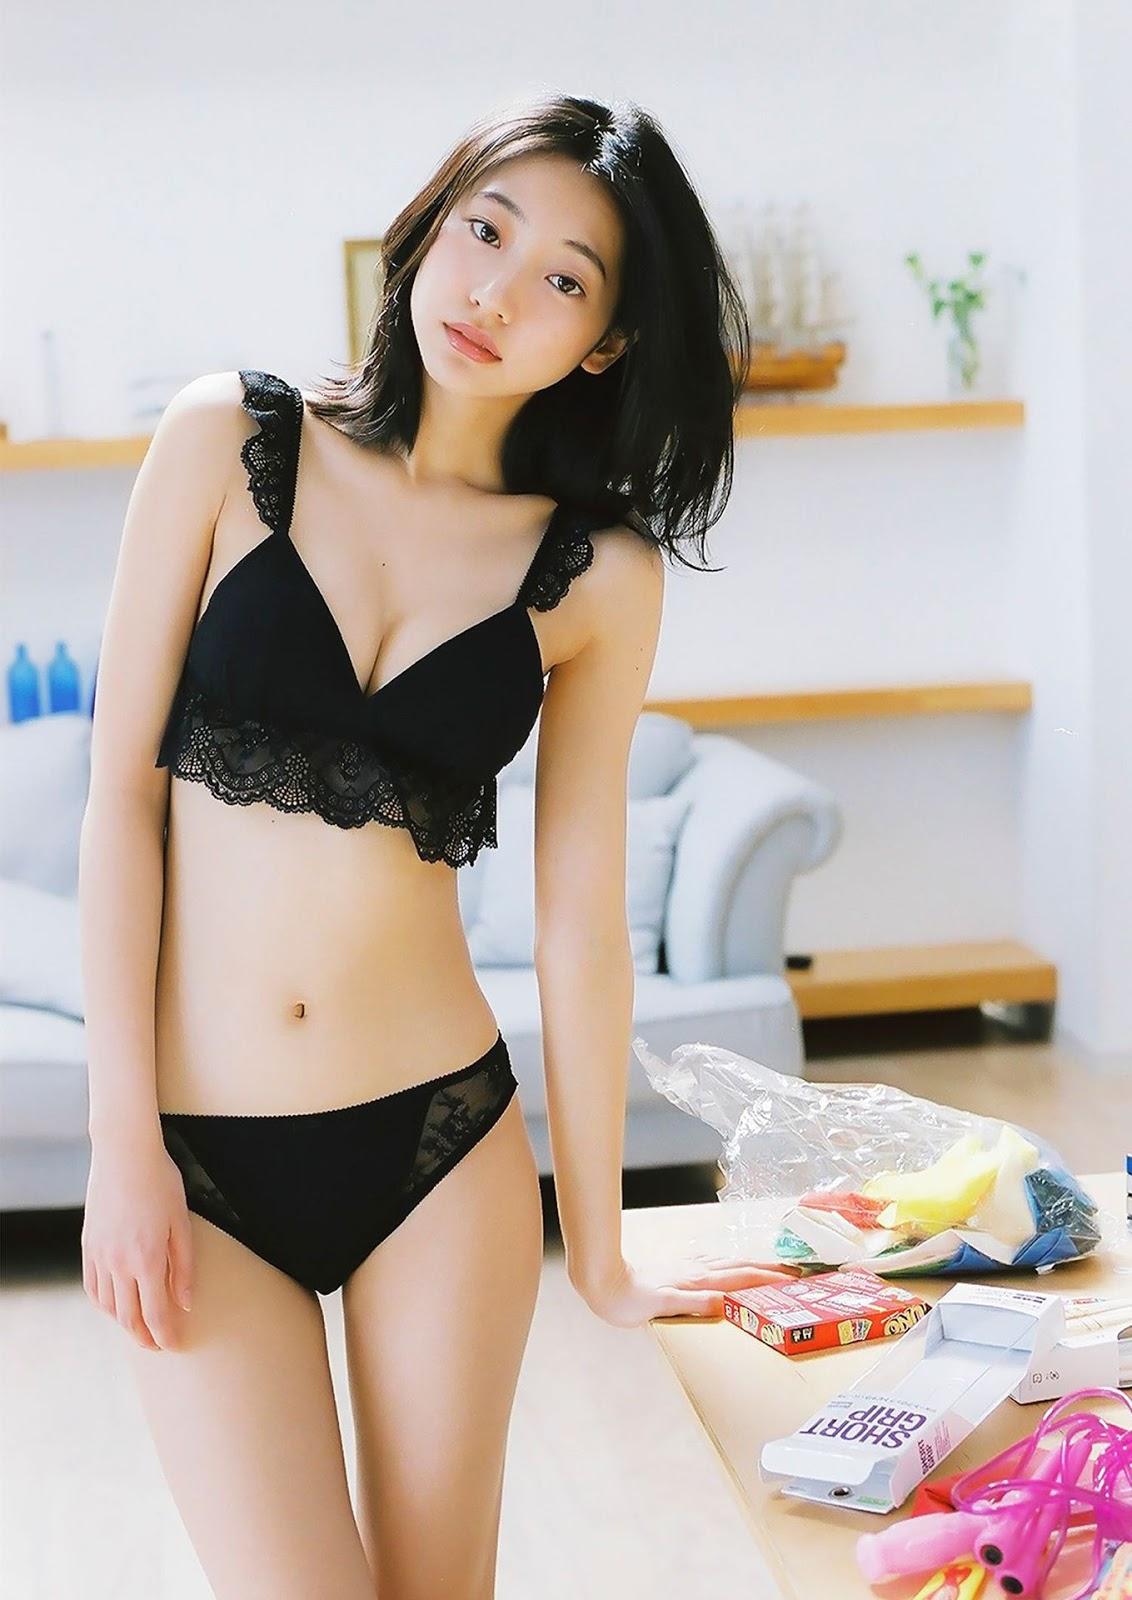 Petite Asian Models